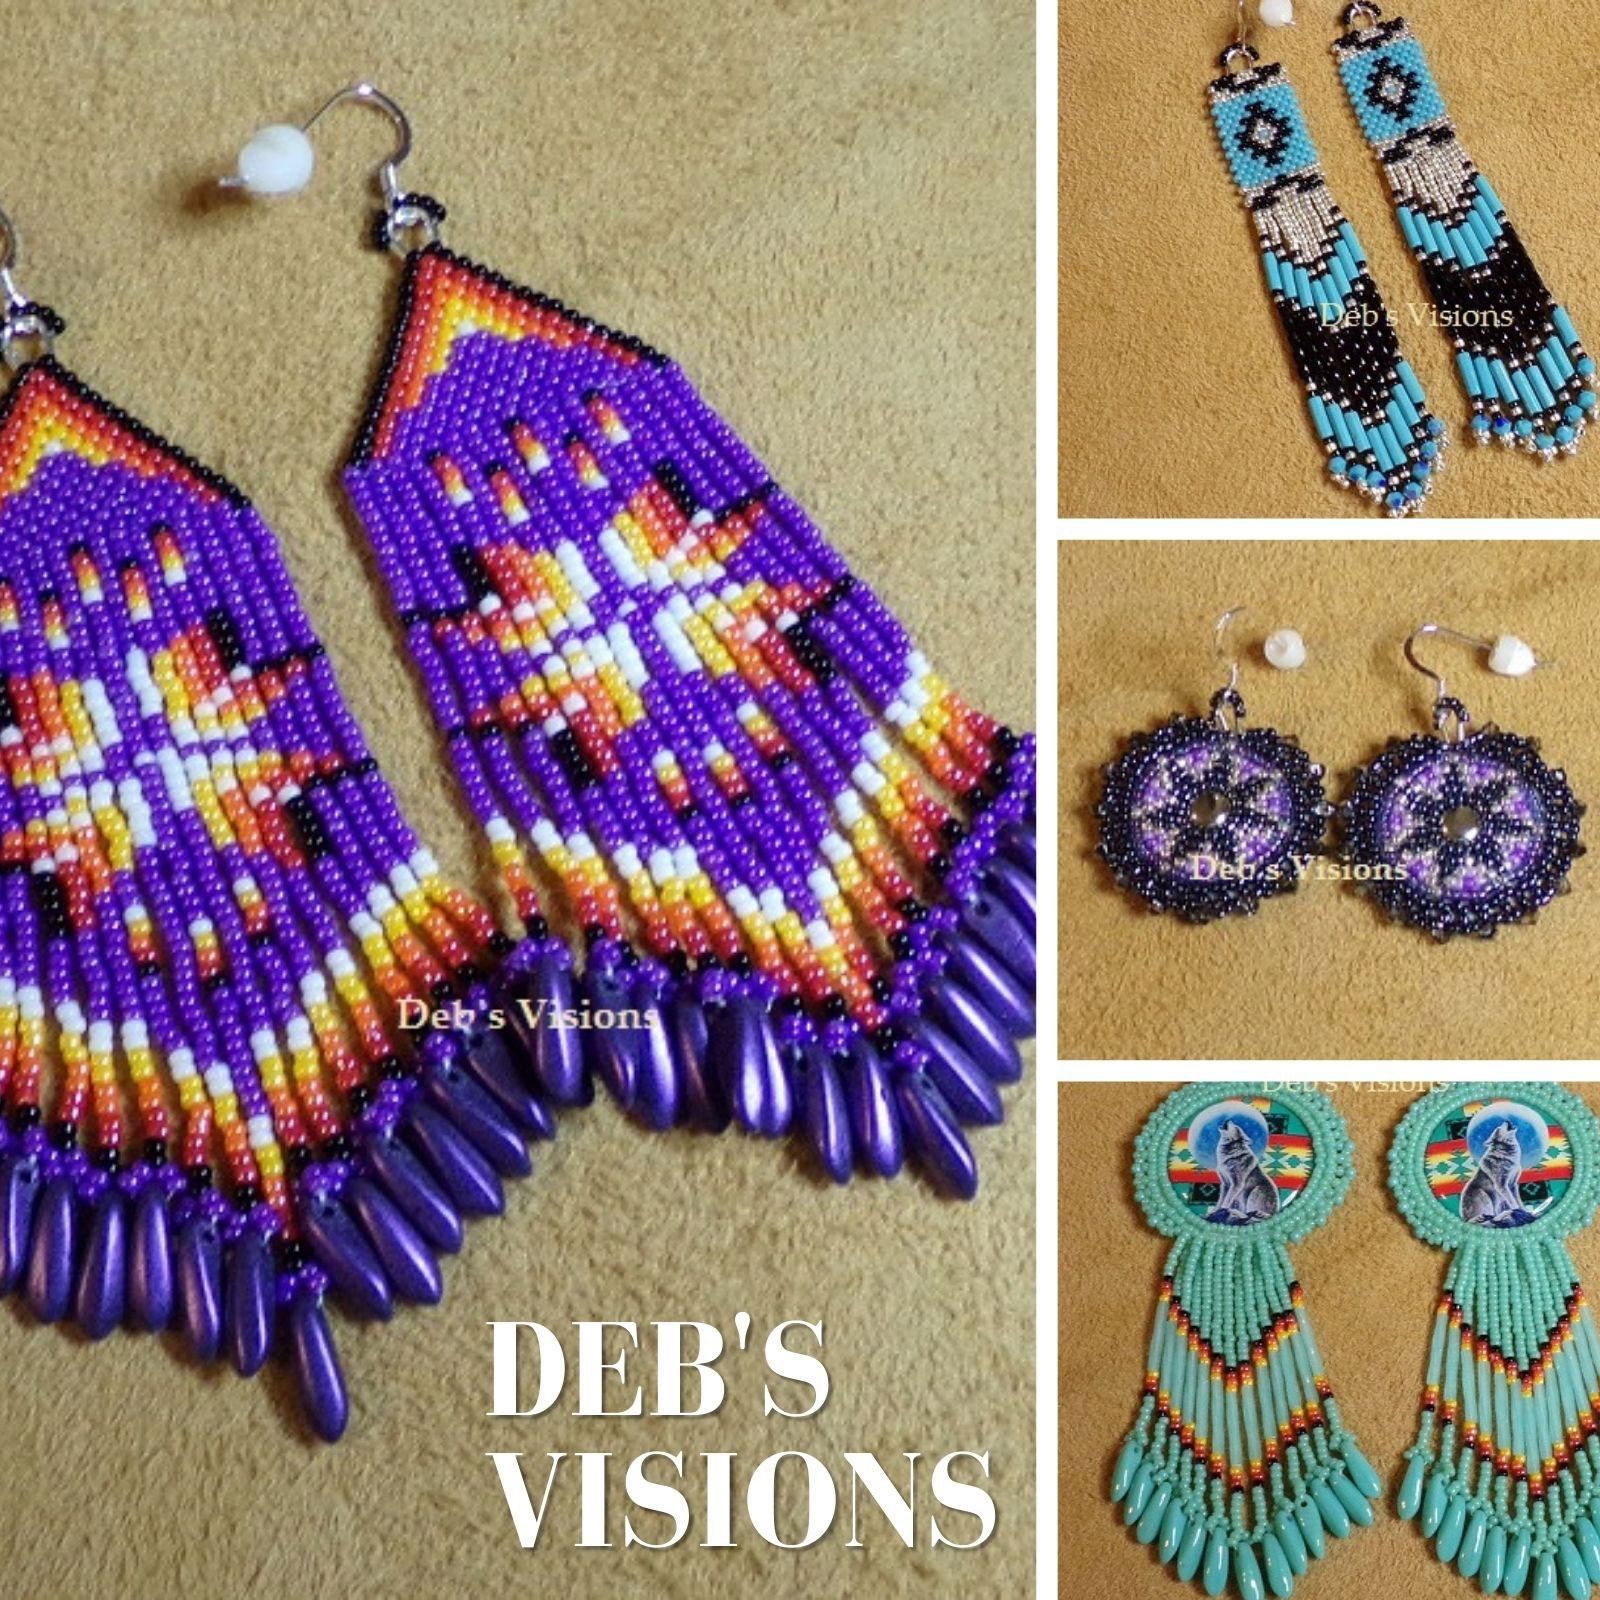 Deb's Visions